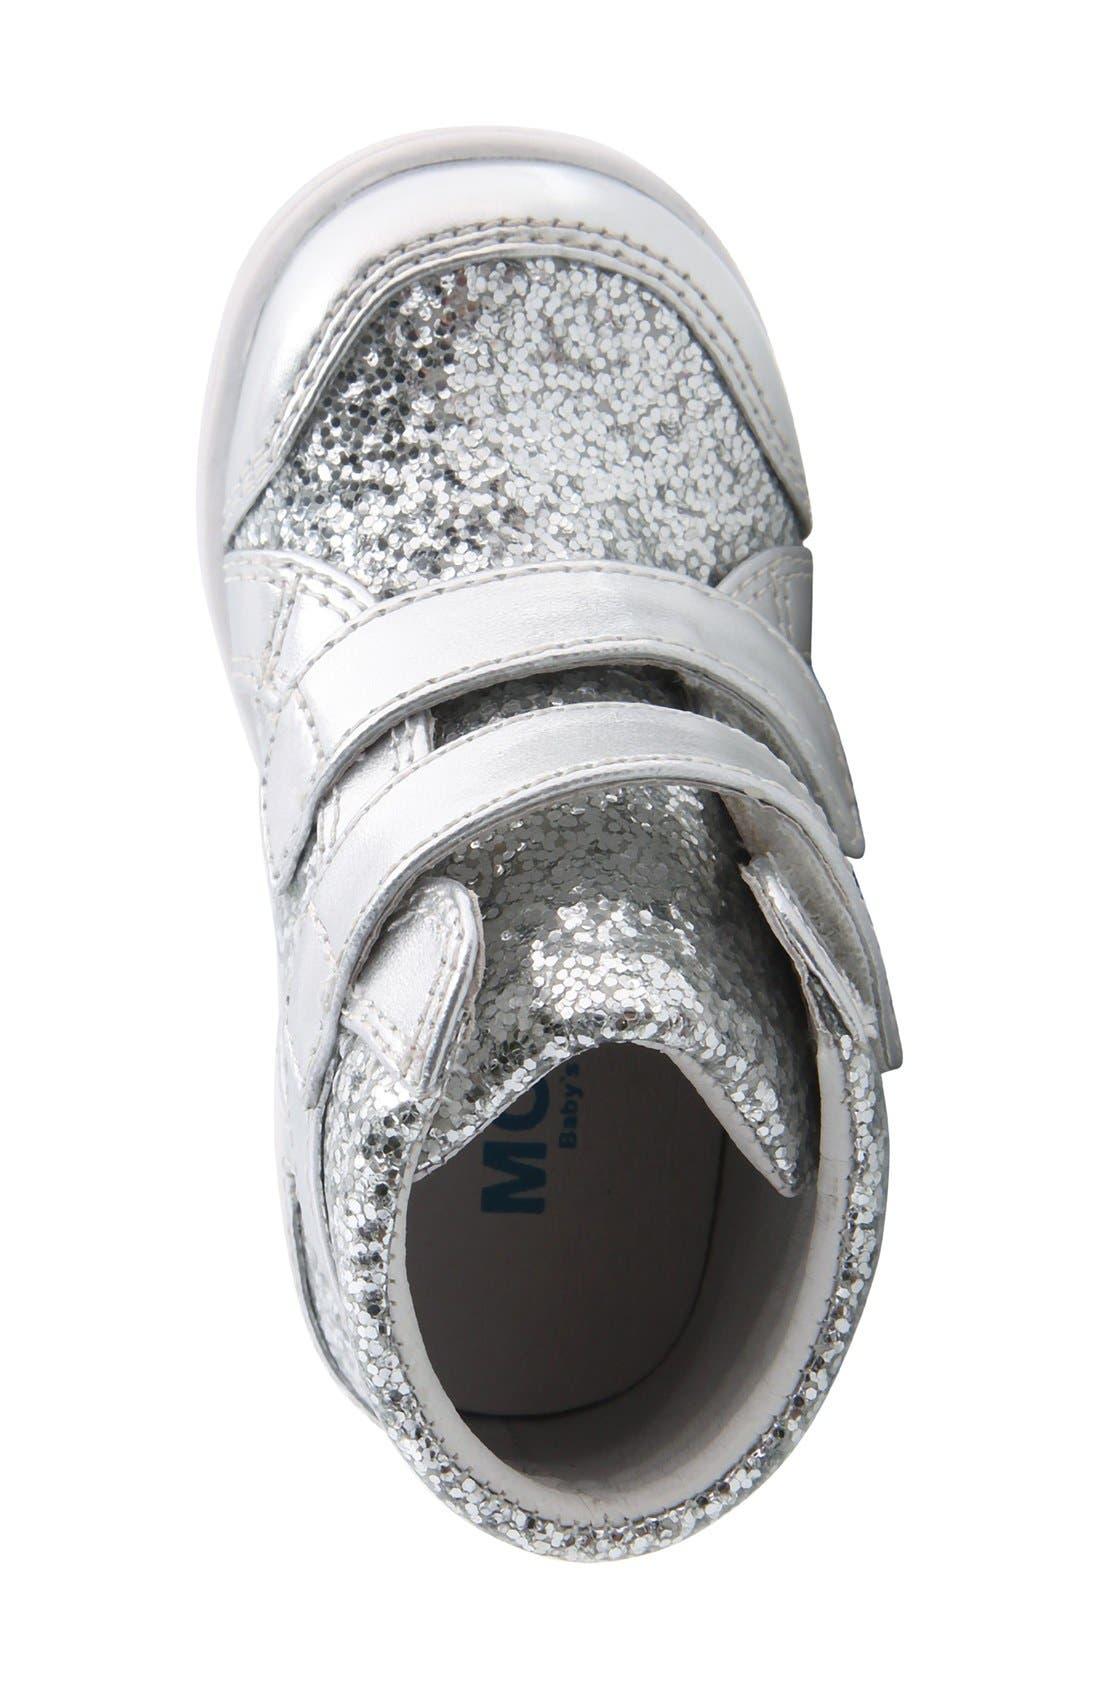 Nina 'Stardust' Metallic High Top Sneaker,                             Alternate thumbnail 2, color,                             Silver Metallic